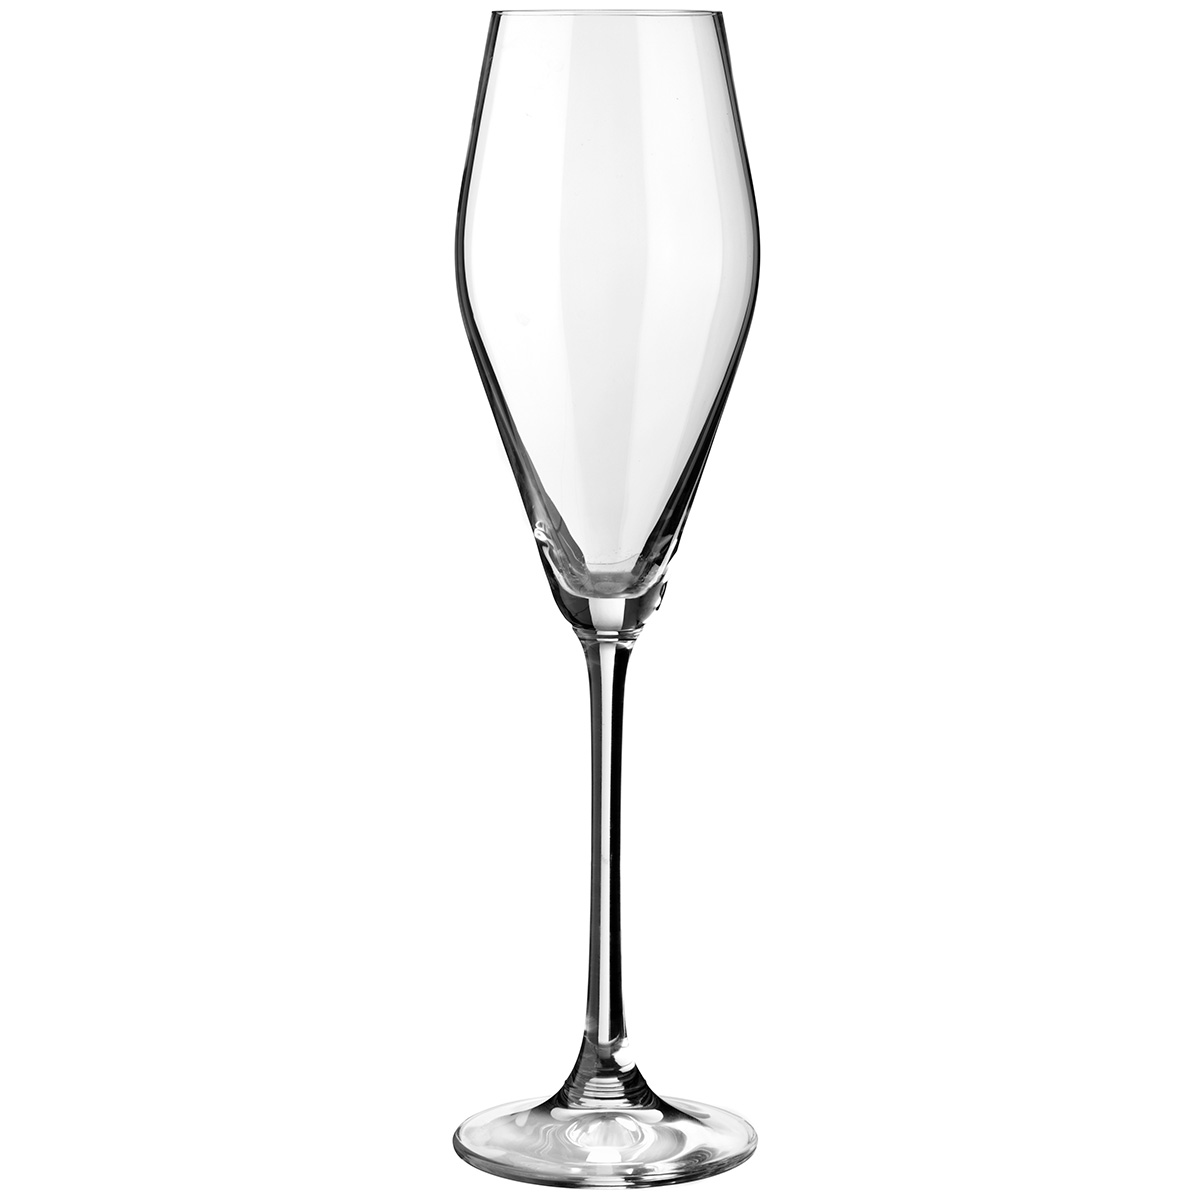 Image of   Le Creuset champagneglas - 4 stk.